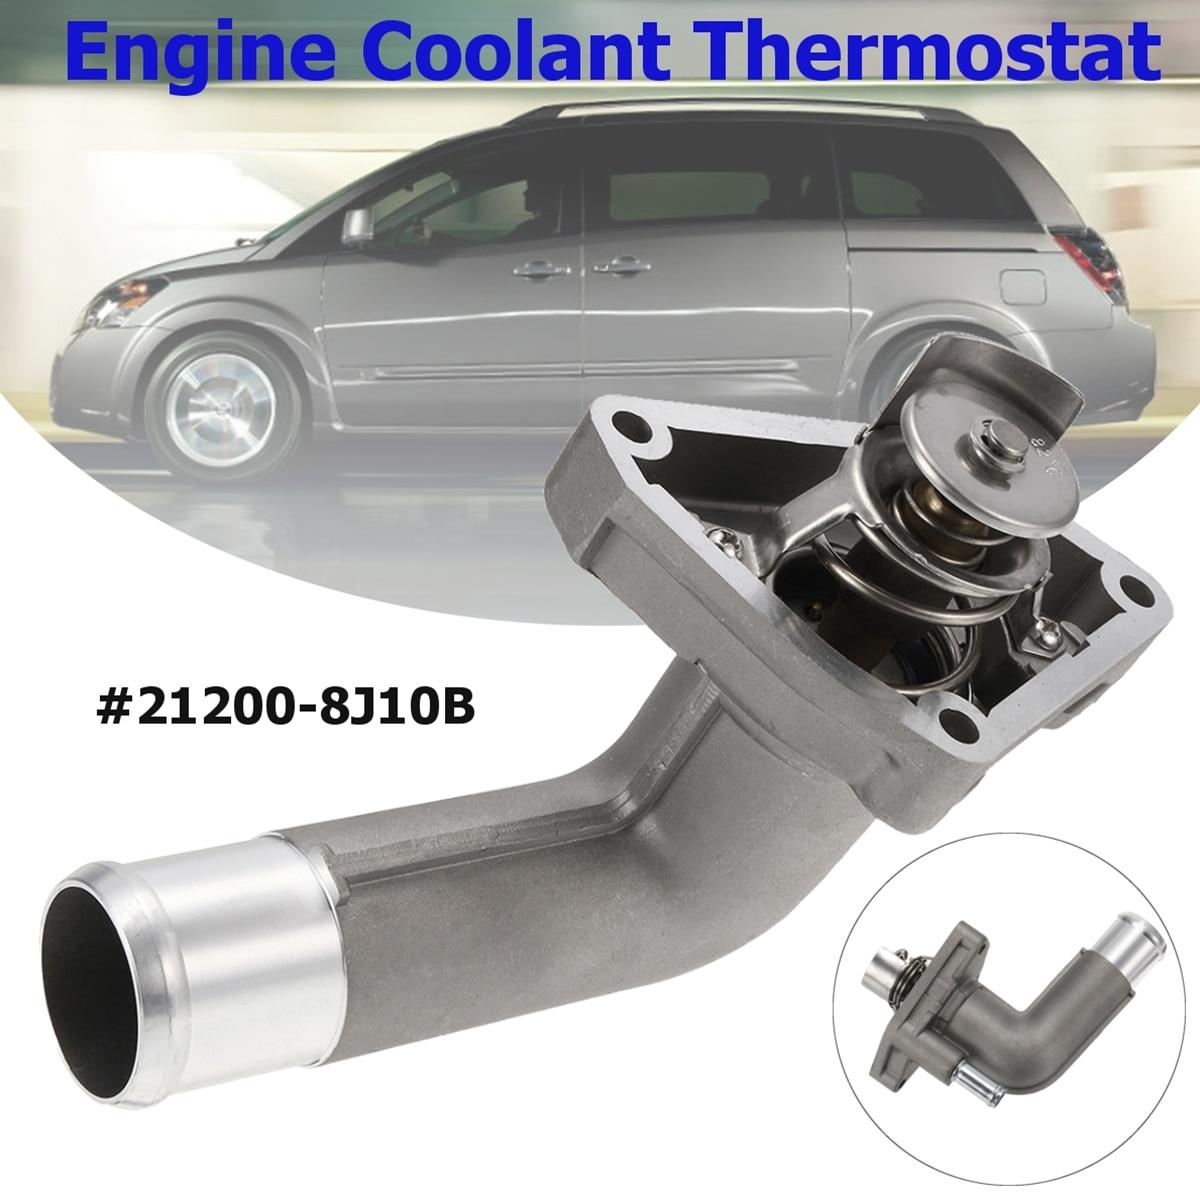 Car Engine Coolant Thermostat For Nissan Quest Maxima Murano Altima 2002 2009 21200 8j10b 13050 Za000 212008j10b 13050za00 In Thermostats Parts From